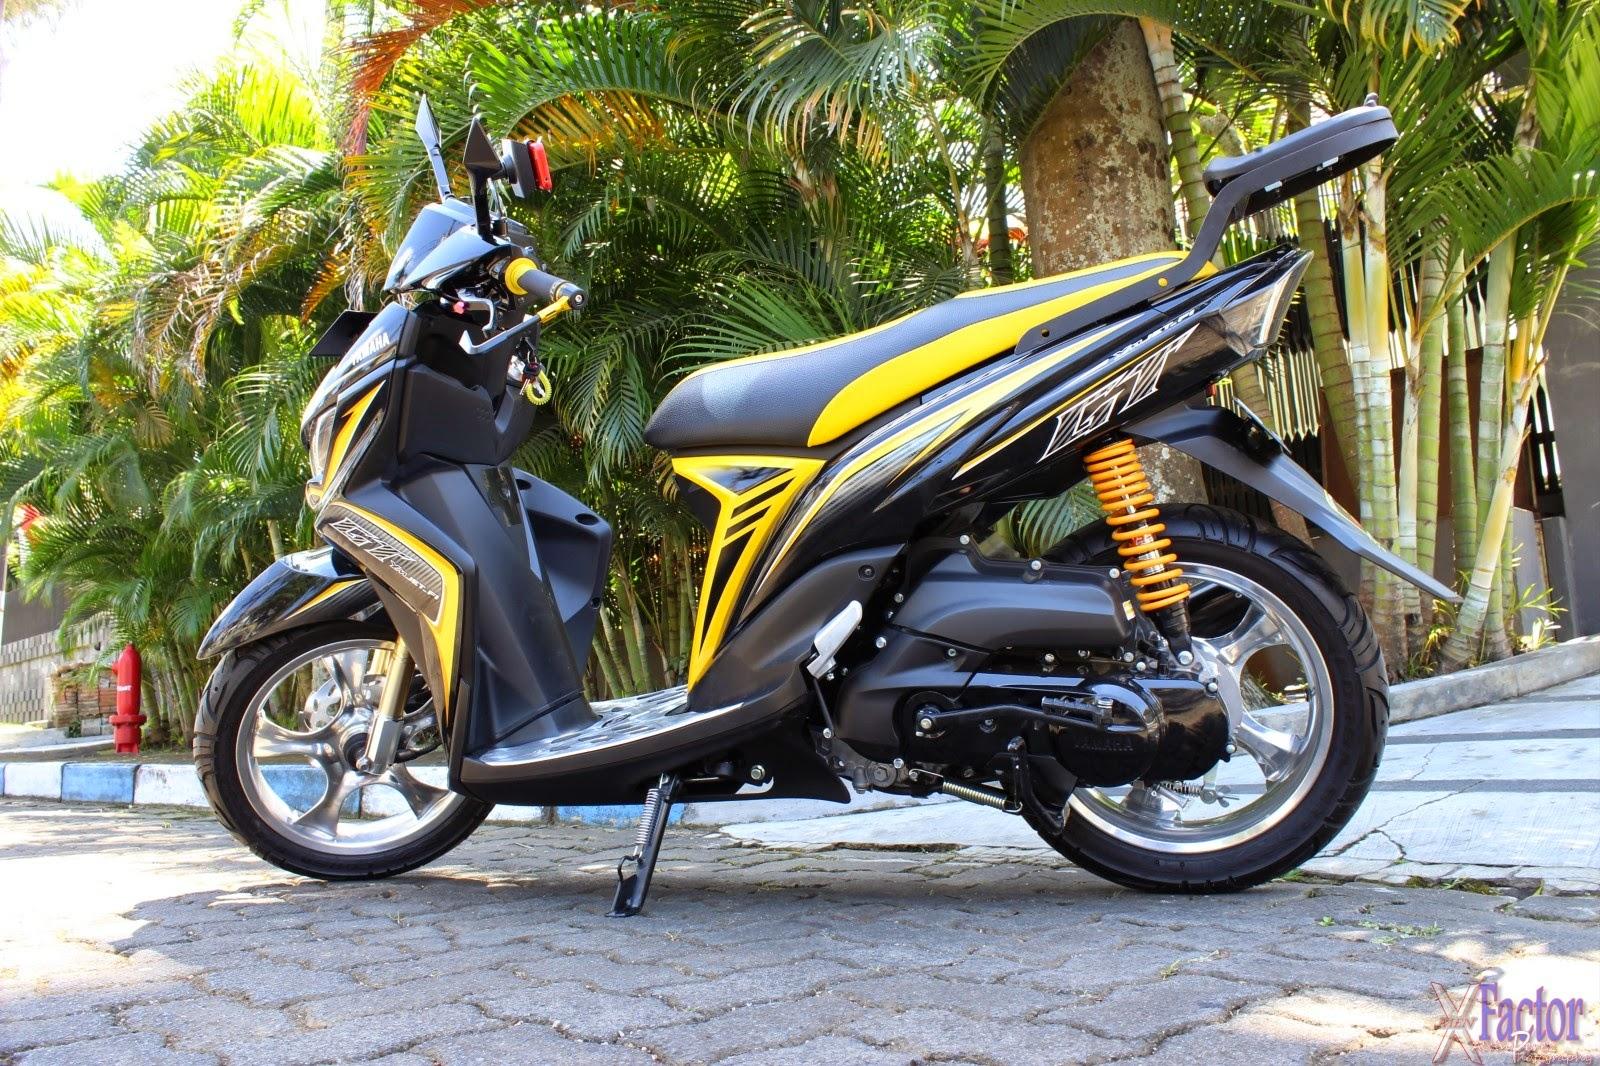 modifikasi motor mio gt 2015 terbaru